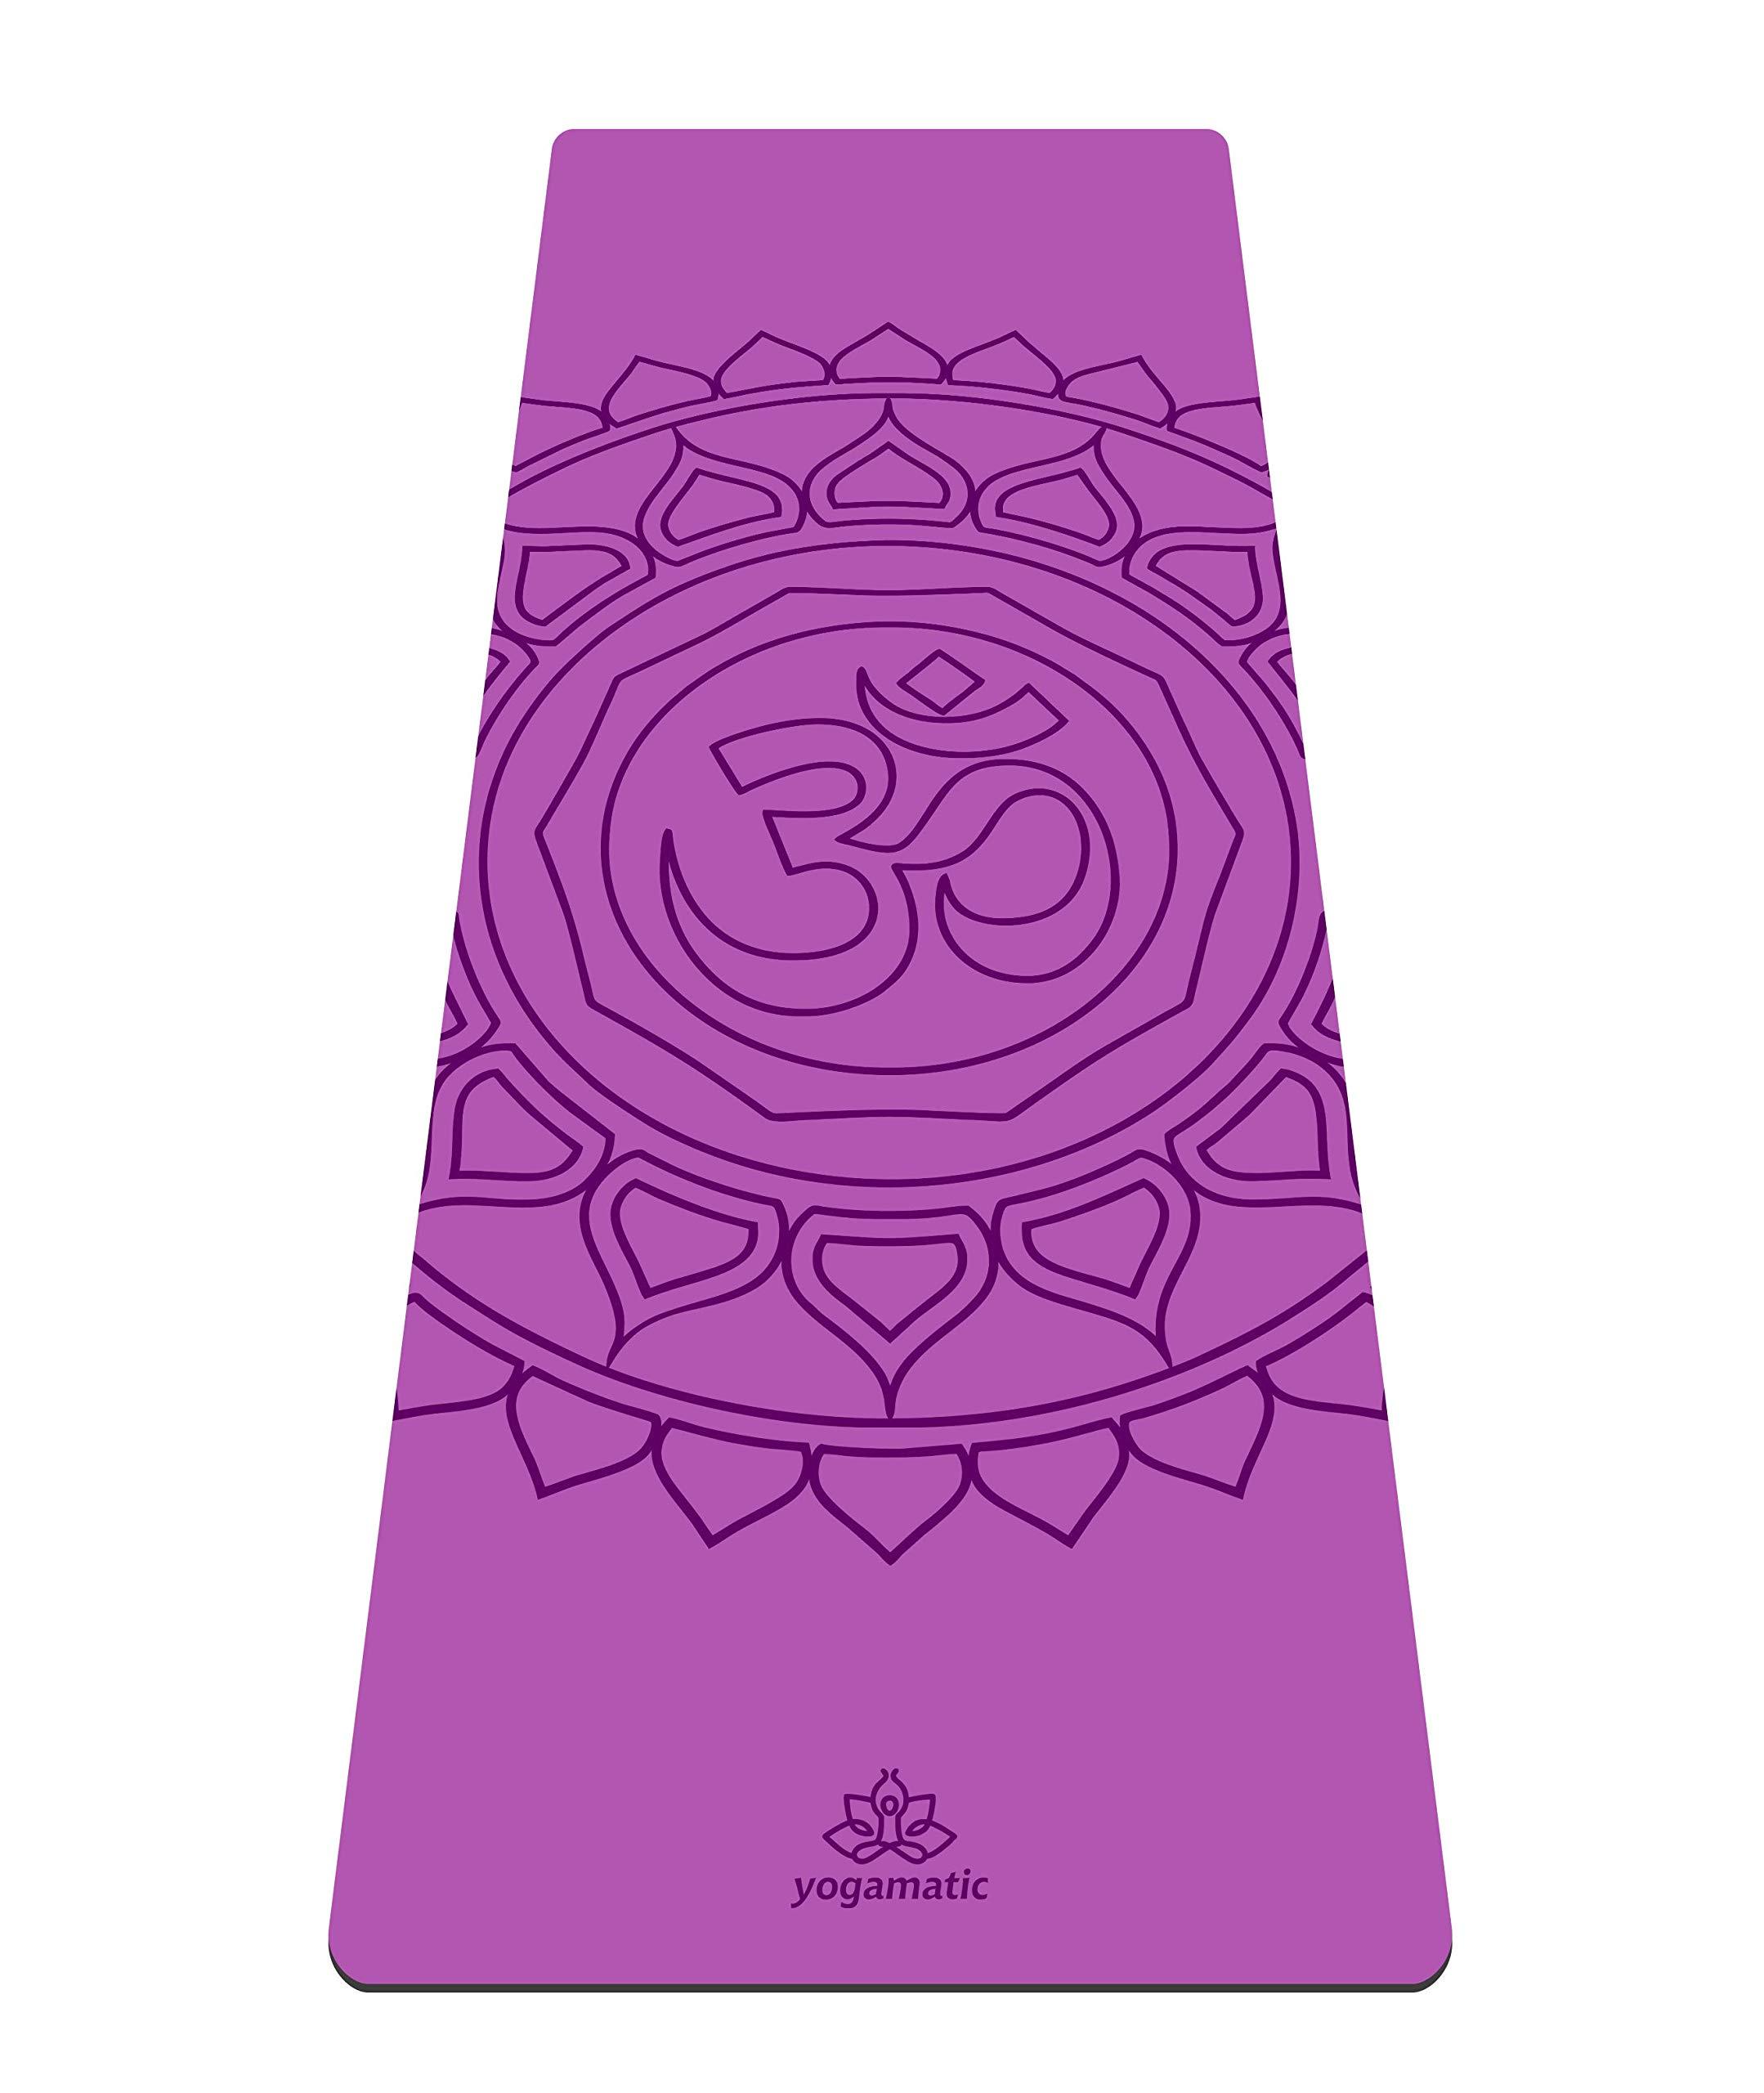 Artmatic Premium Eco Friendly Yoga Mat - Hamsa Grey/Natural Rubber Base + Non Slip top/The Best GripForMe System/with Original Unique Alignment (Om Purple)